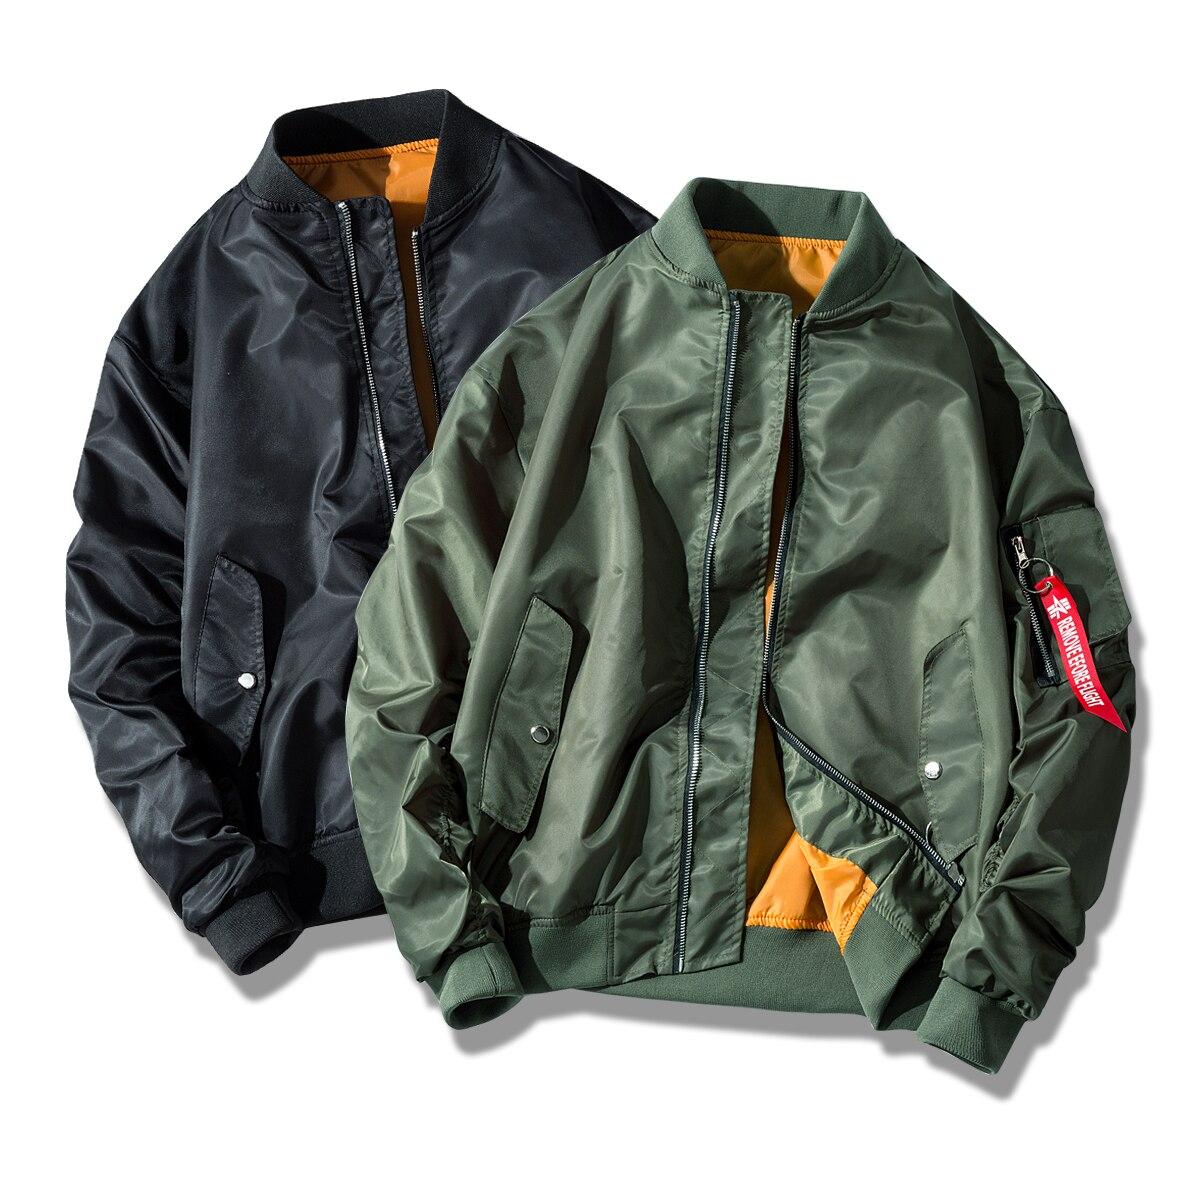 2019 Men Clothing US Air Force Pilot Ma1 Bomber Flight Jacket Waterproof  Mens Women coat Army Military Motorcycle Race Coats